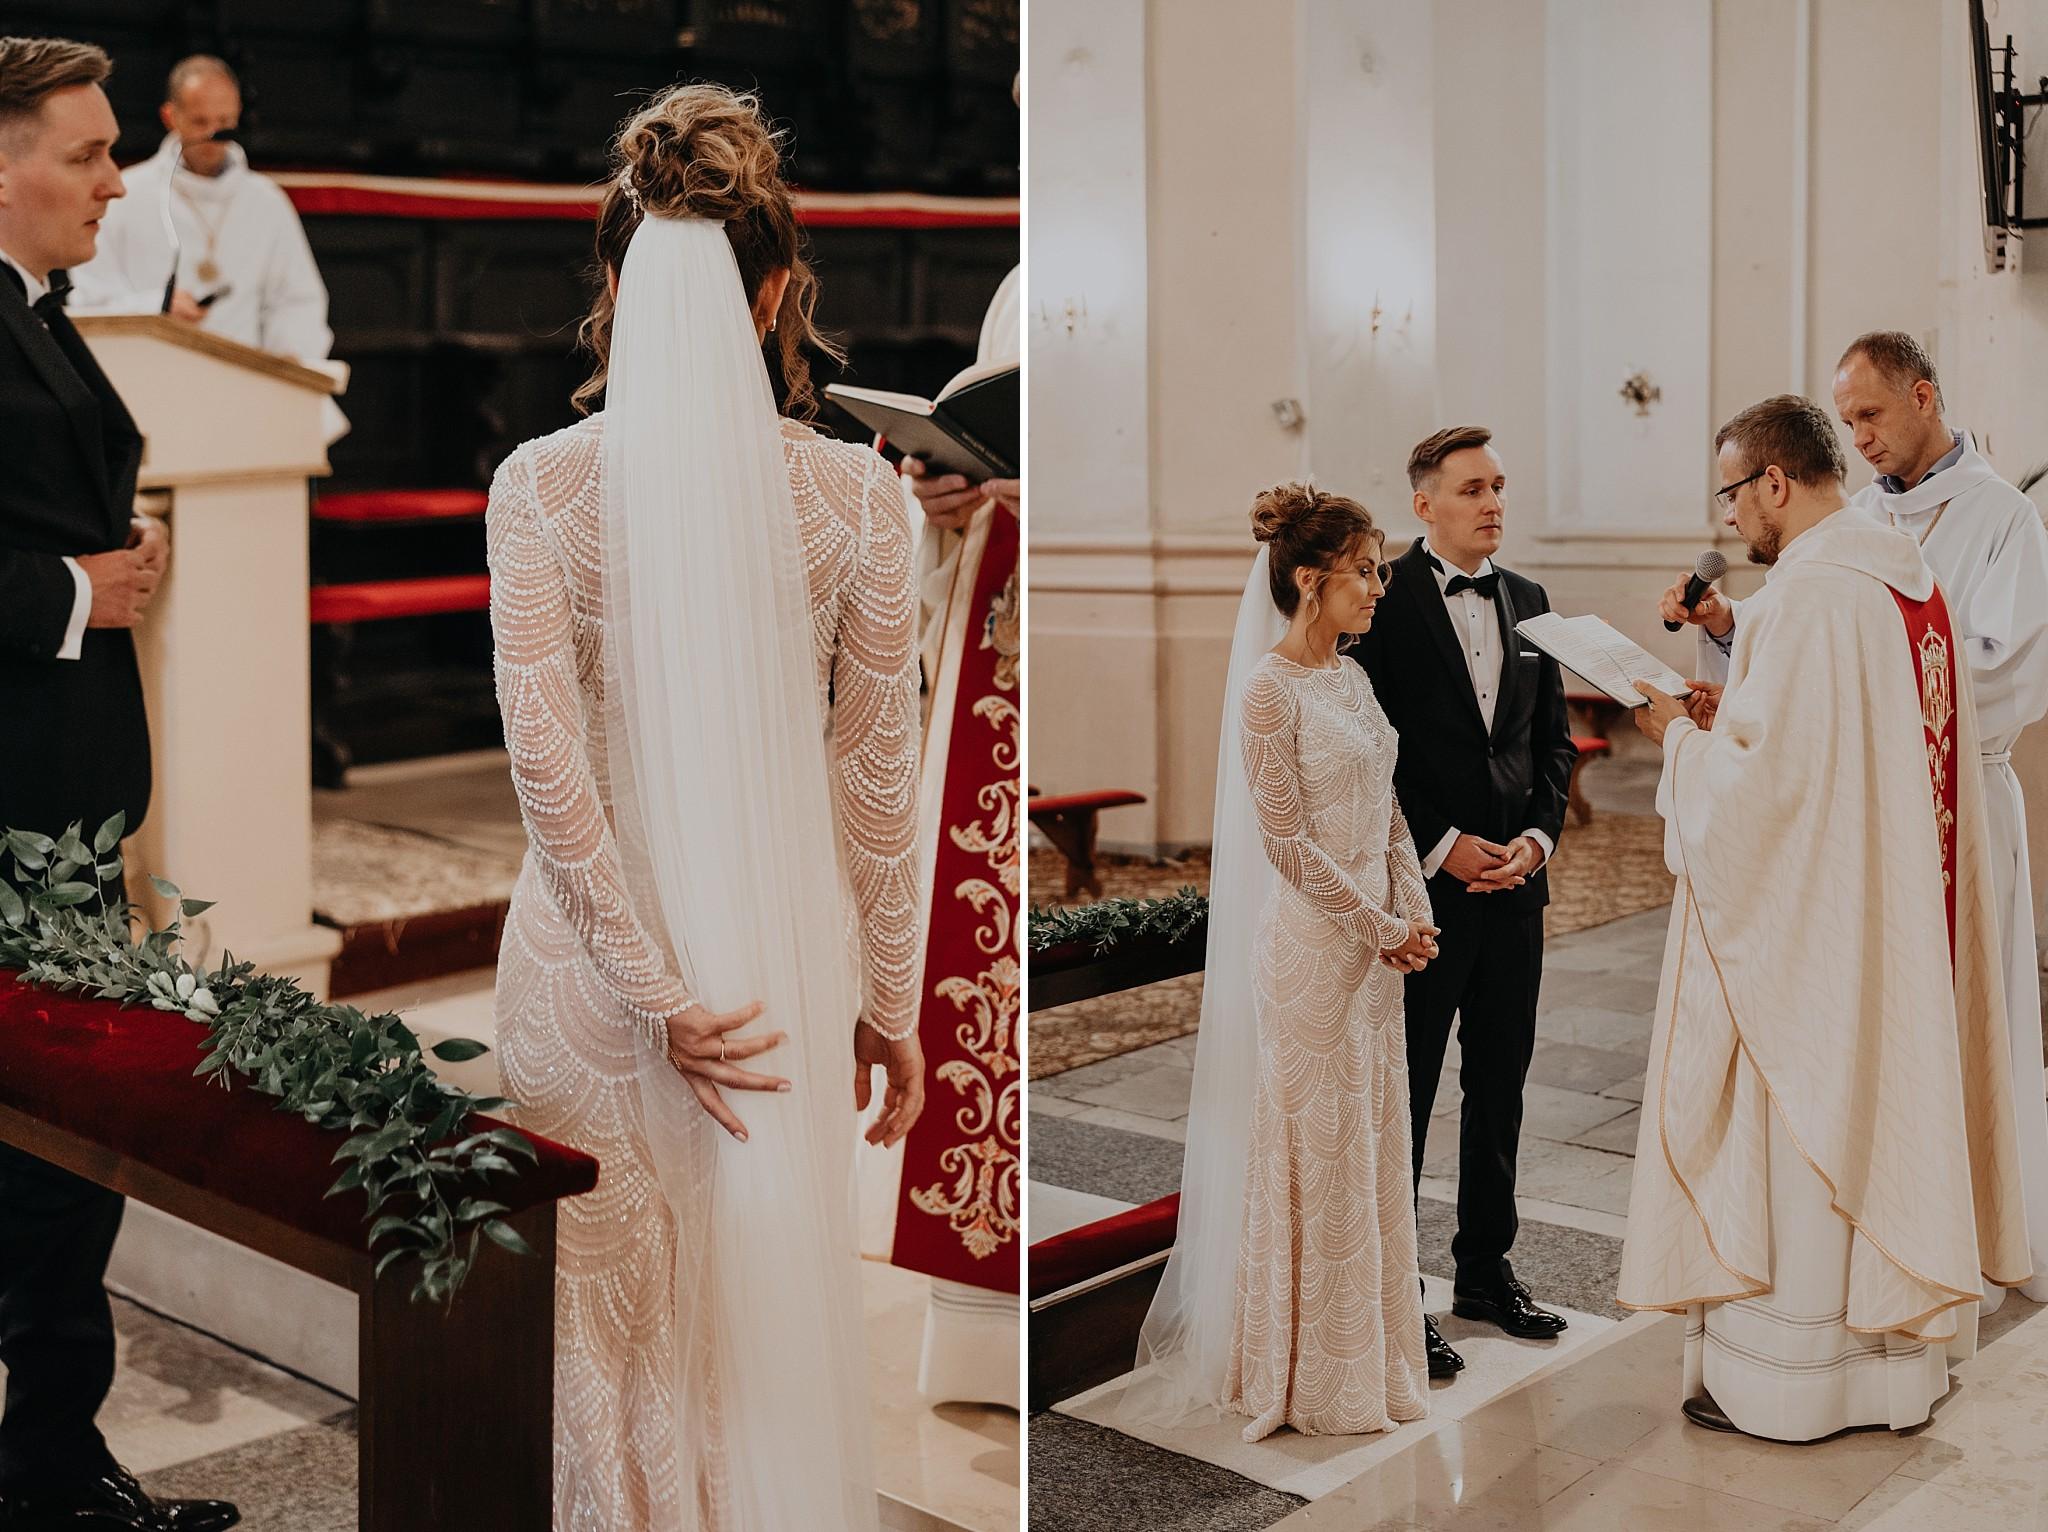 fotograf poznan wesele dobra truskawka piekne wesele pod poznaniem wesele w dobrej truskawce piekna para mloda slub marzen slub koronawirus slub listopad wesele koronawirus 164